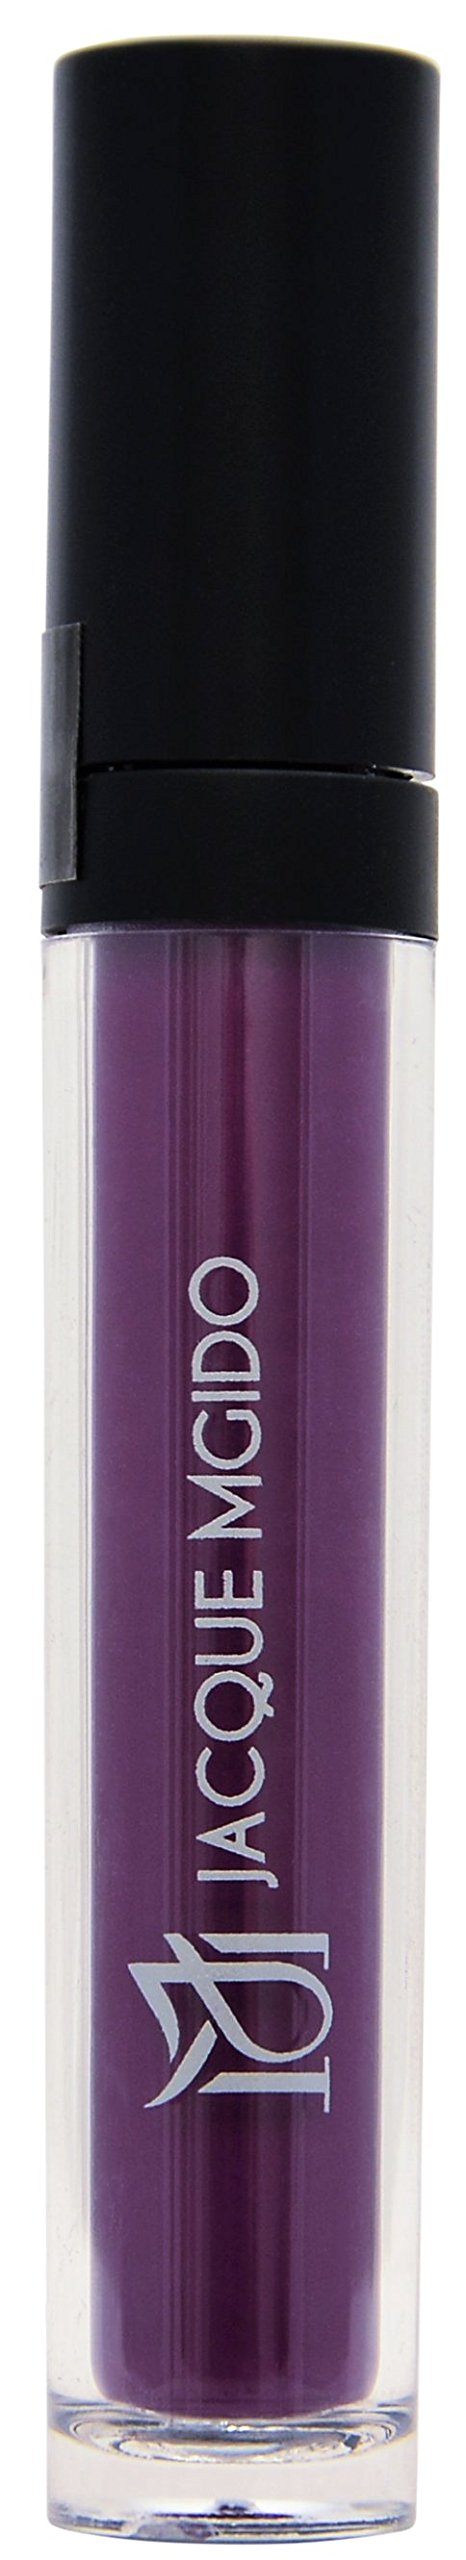 Jacque Mgido Cosmetics - Dylan Dark (Dark Purple) Crack Free Lip Stain, Matte Finish - 0.18 Ounce (Pack of 1)